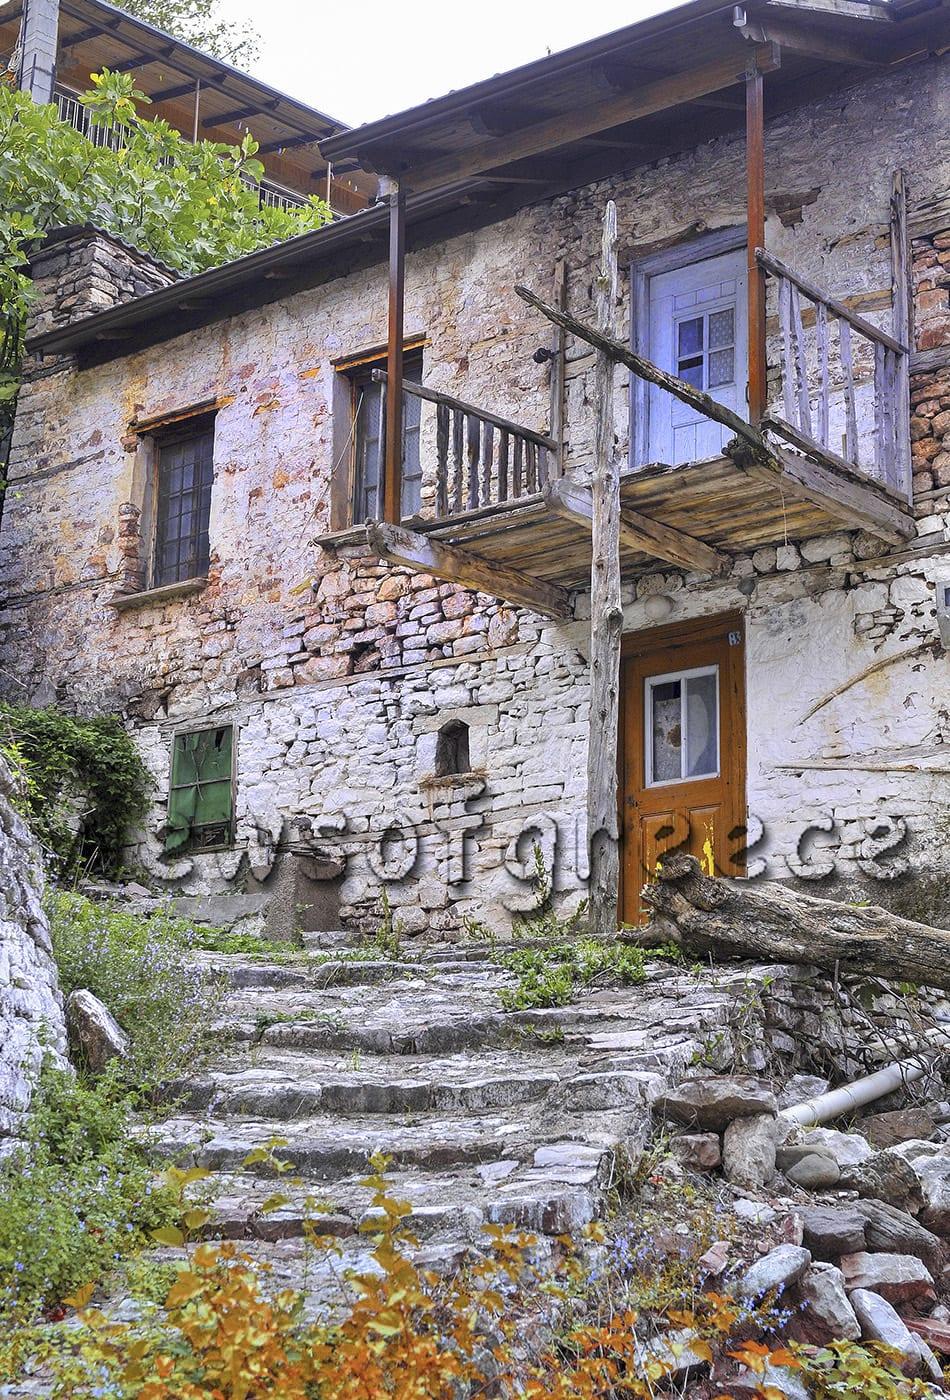 central greece, eyrytania, mountain, nature, mountains, Europe, Veluxi Mountain, Βελούχι, Ευρυτανία, Τυμφρηστός, χωριά, μπαρουτόμυλος, Φθινόπωρο, 4χ4